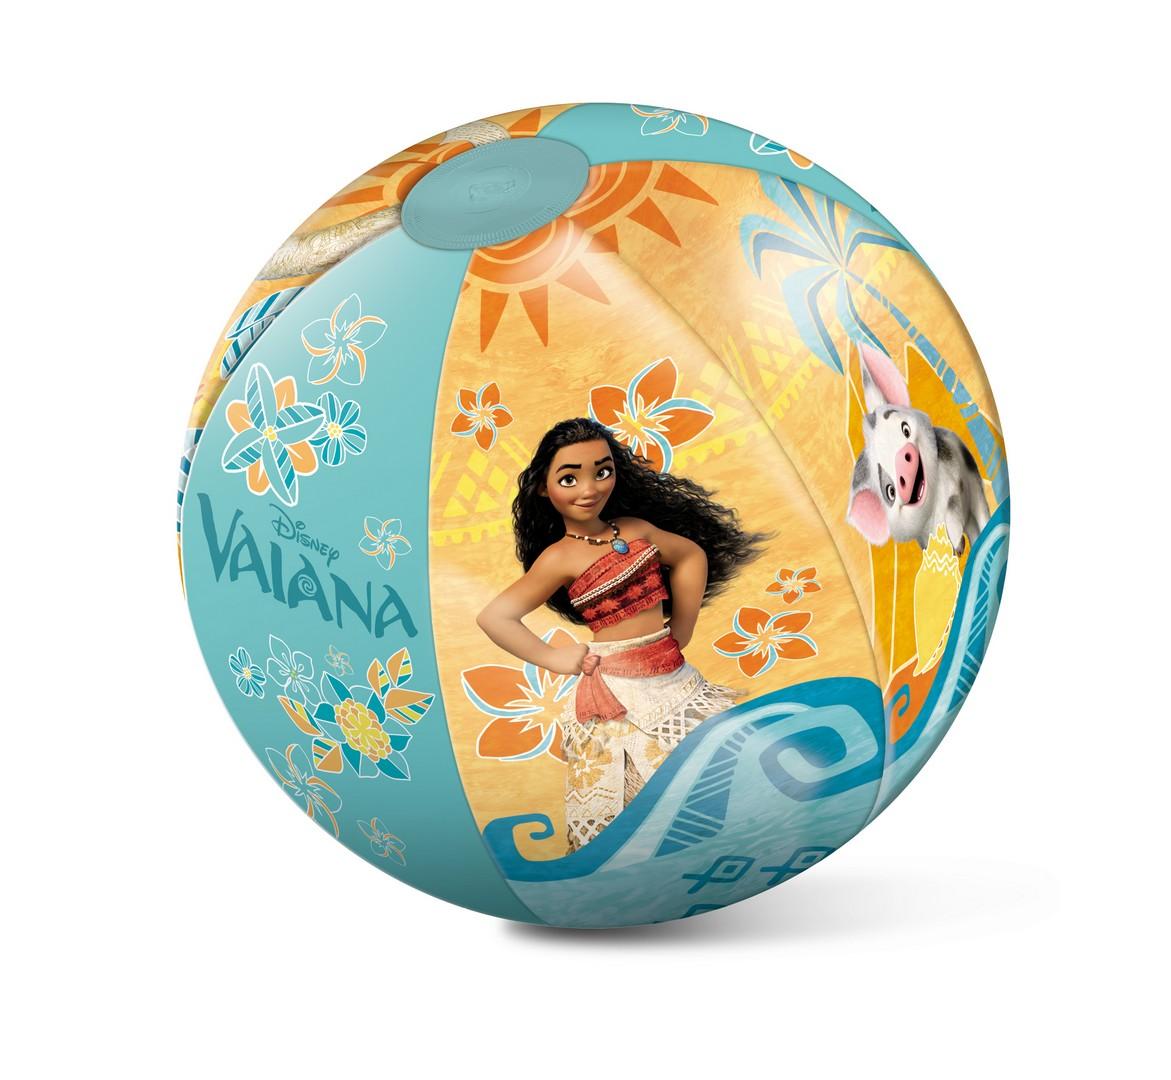 nafukovacia lopta Vaiana 50 cm